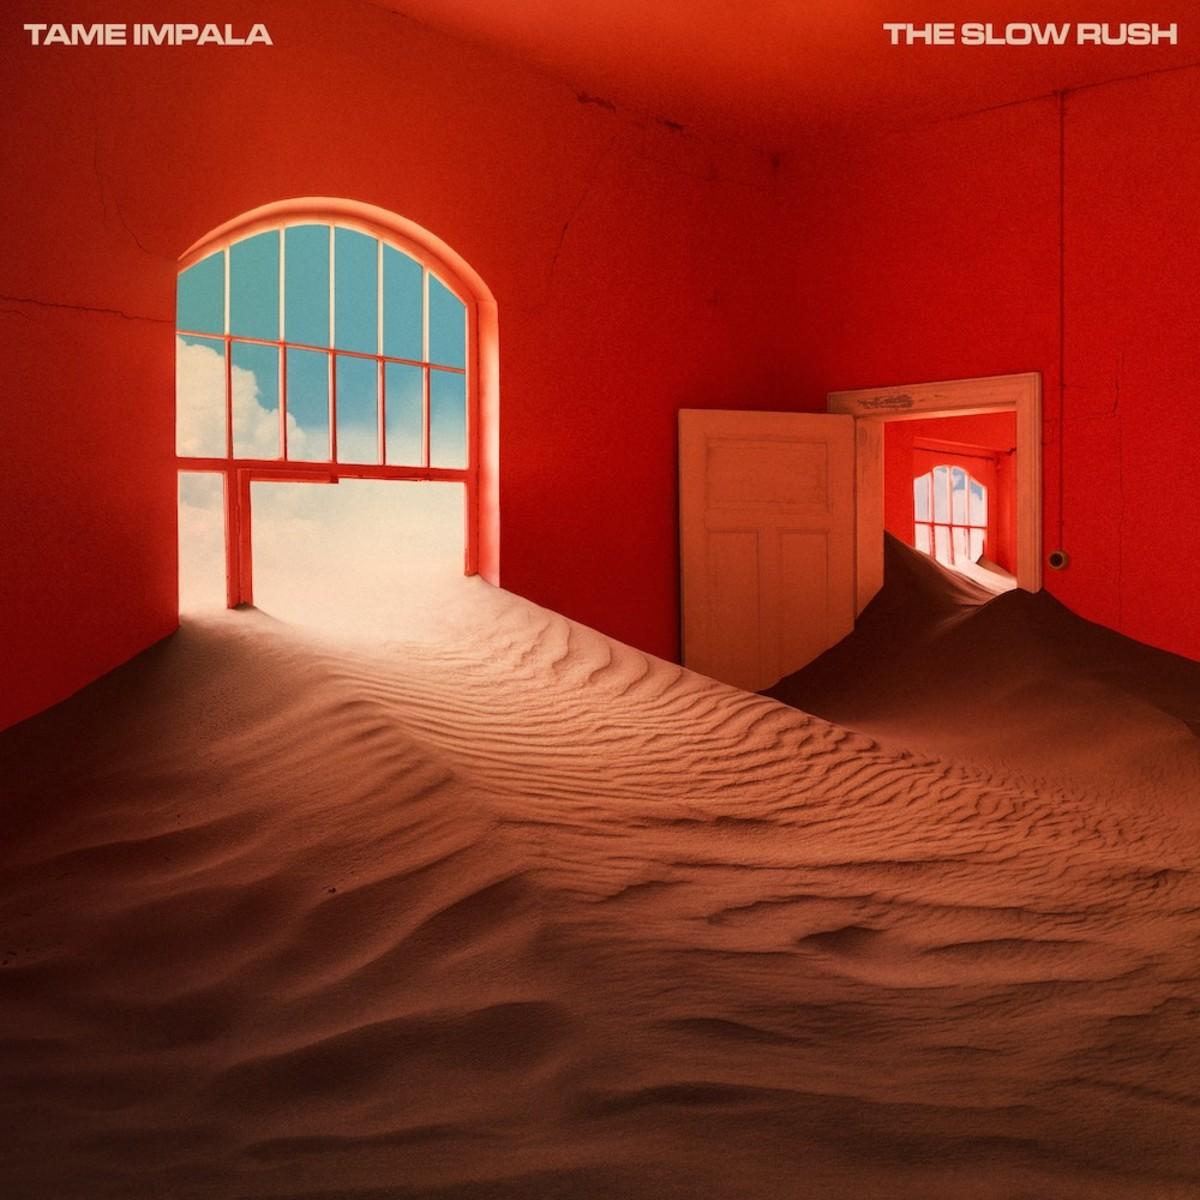 Tame Impala's Fourth Studio Album 'The Slow Rush' Has Arrived